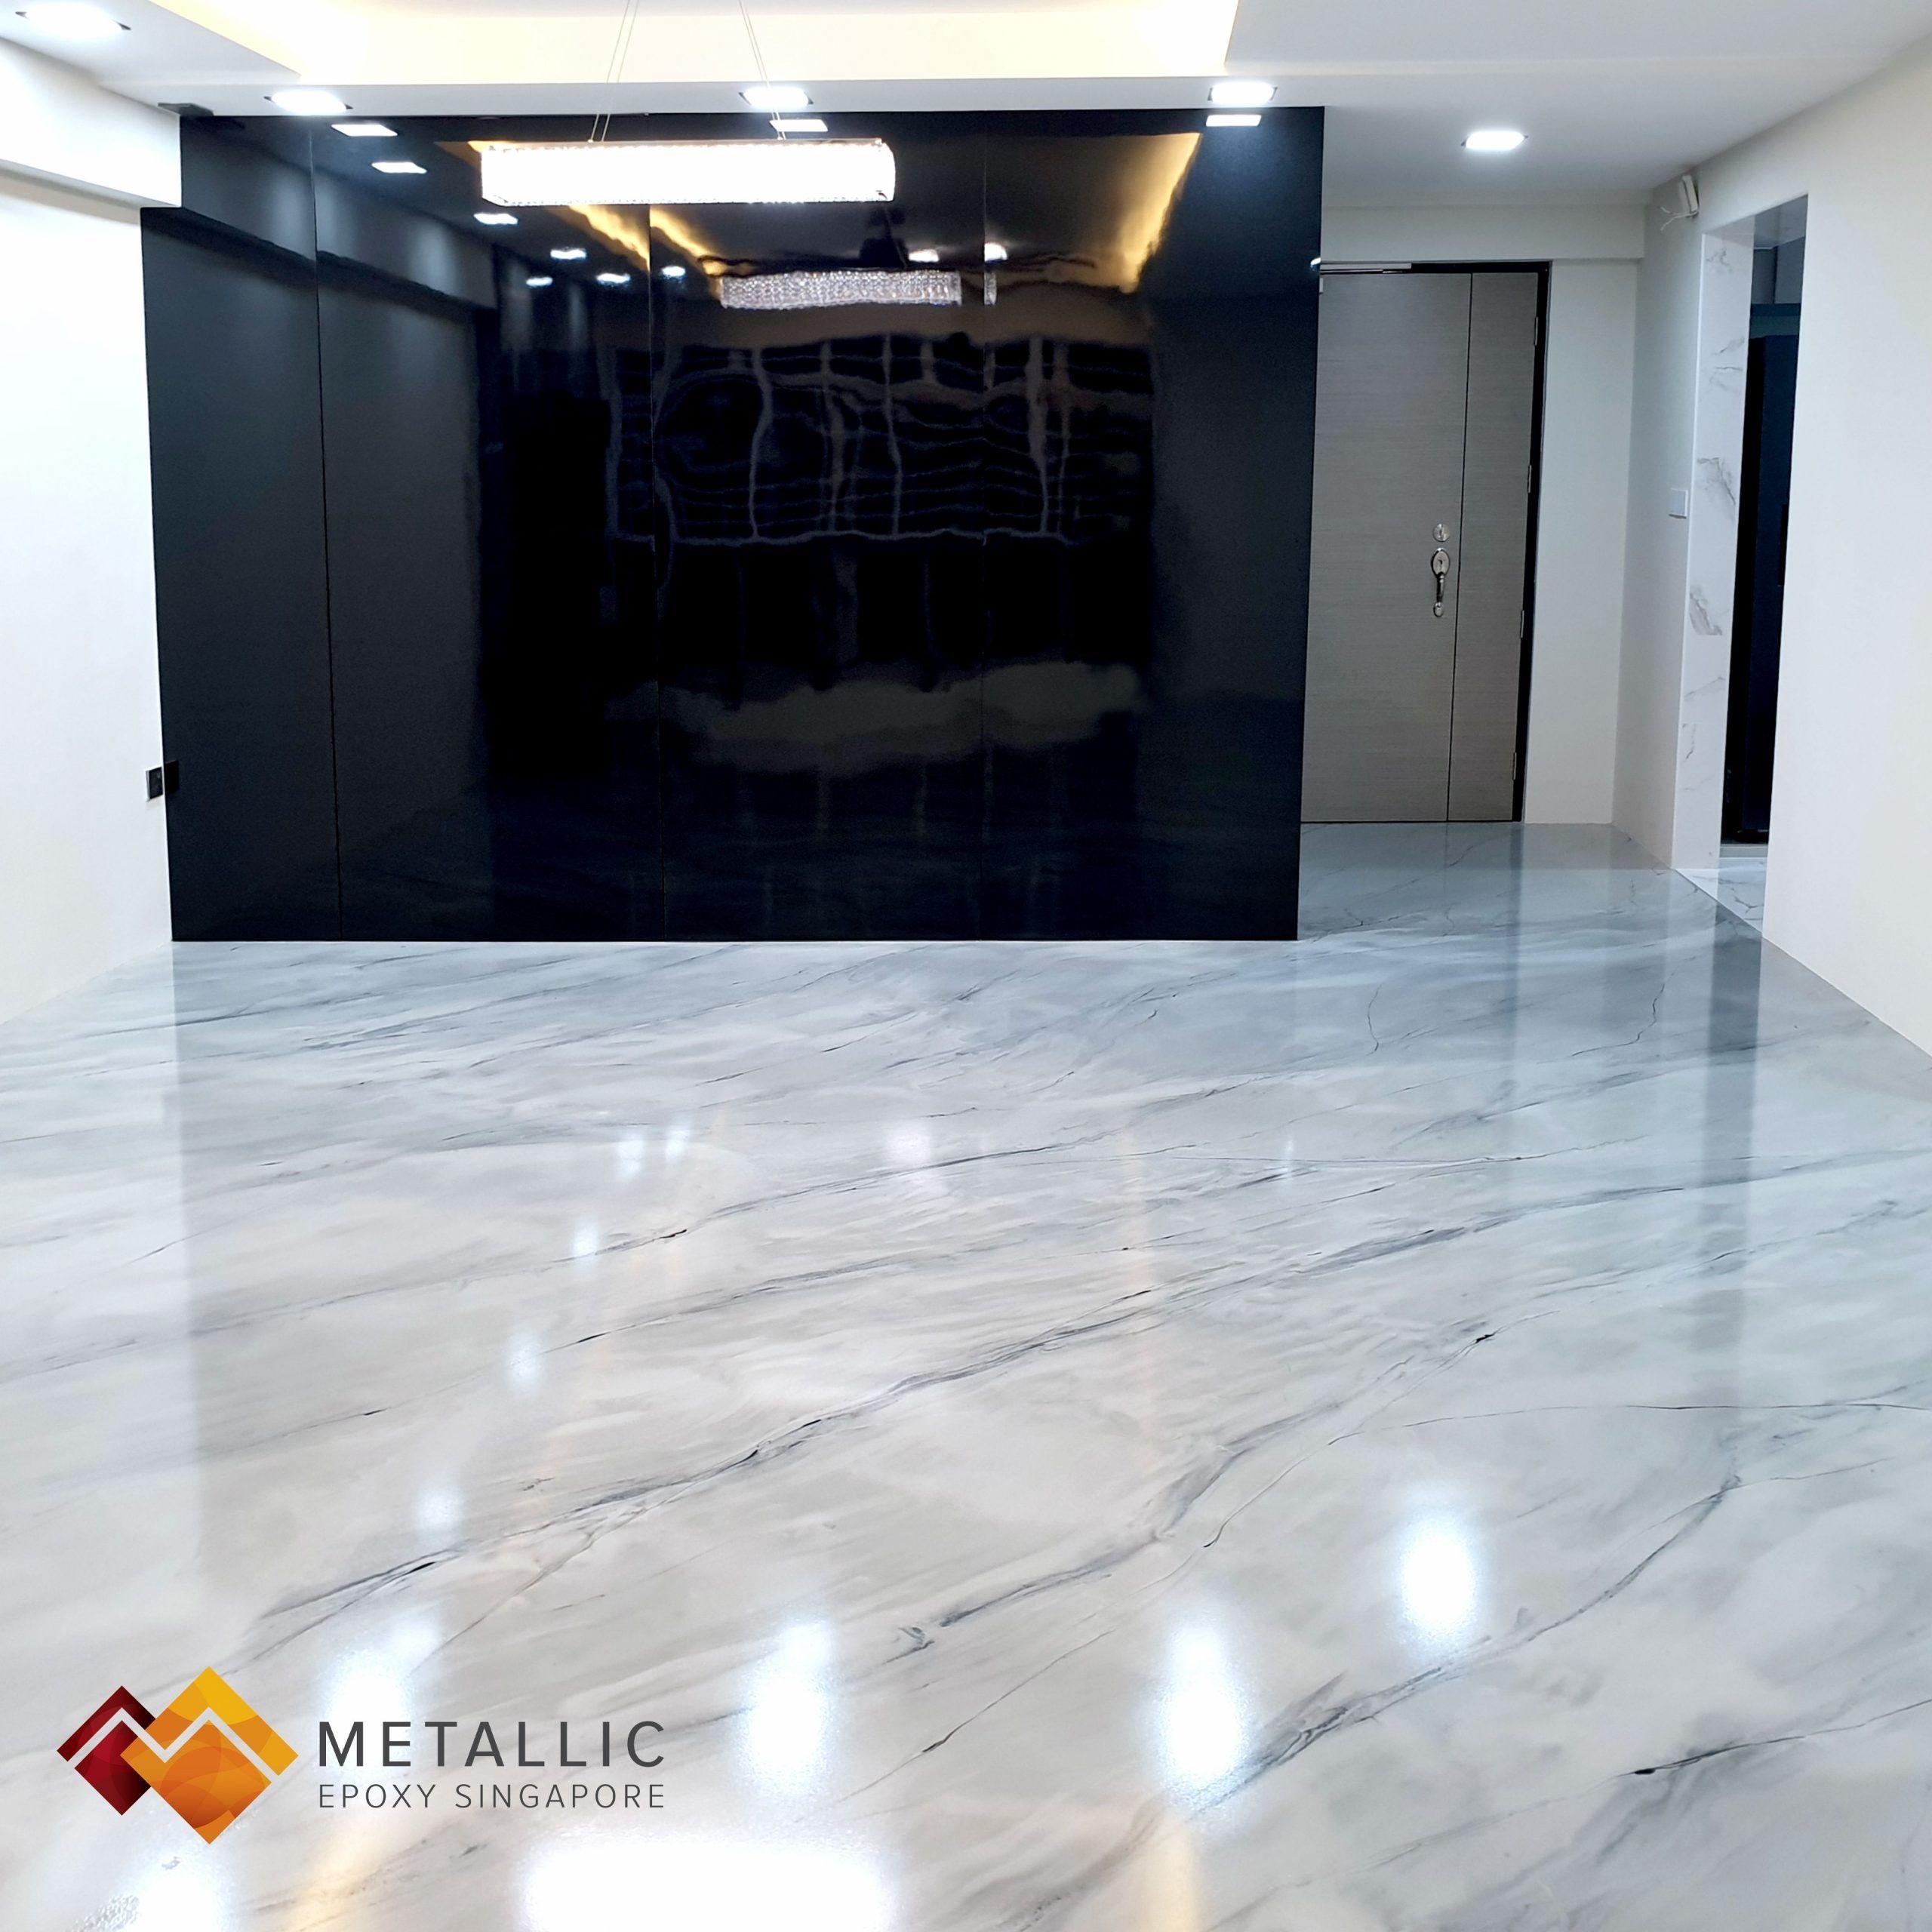 Metallic Epoxy Singapore Grey Mixed Marble Theme Wohnzimmer Boden Epoxy Boden In 2020 Room Flooring Living Room Flooring